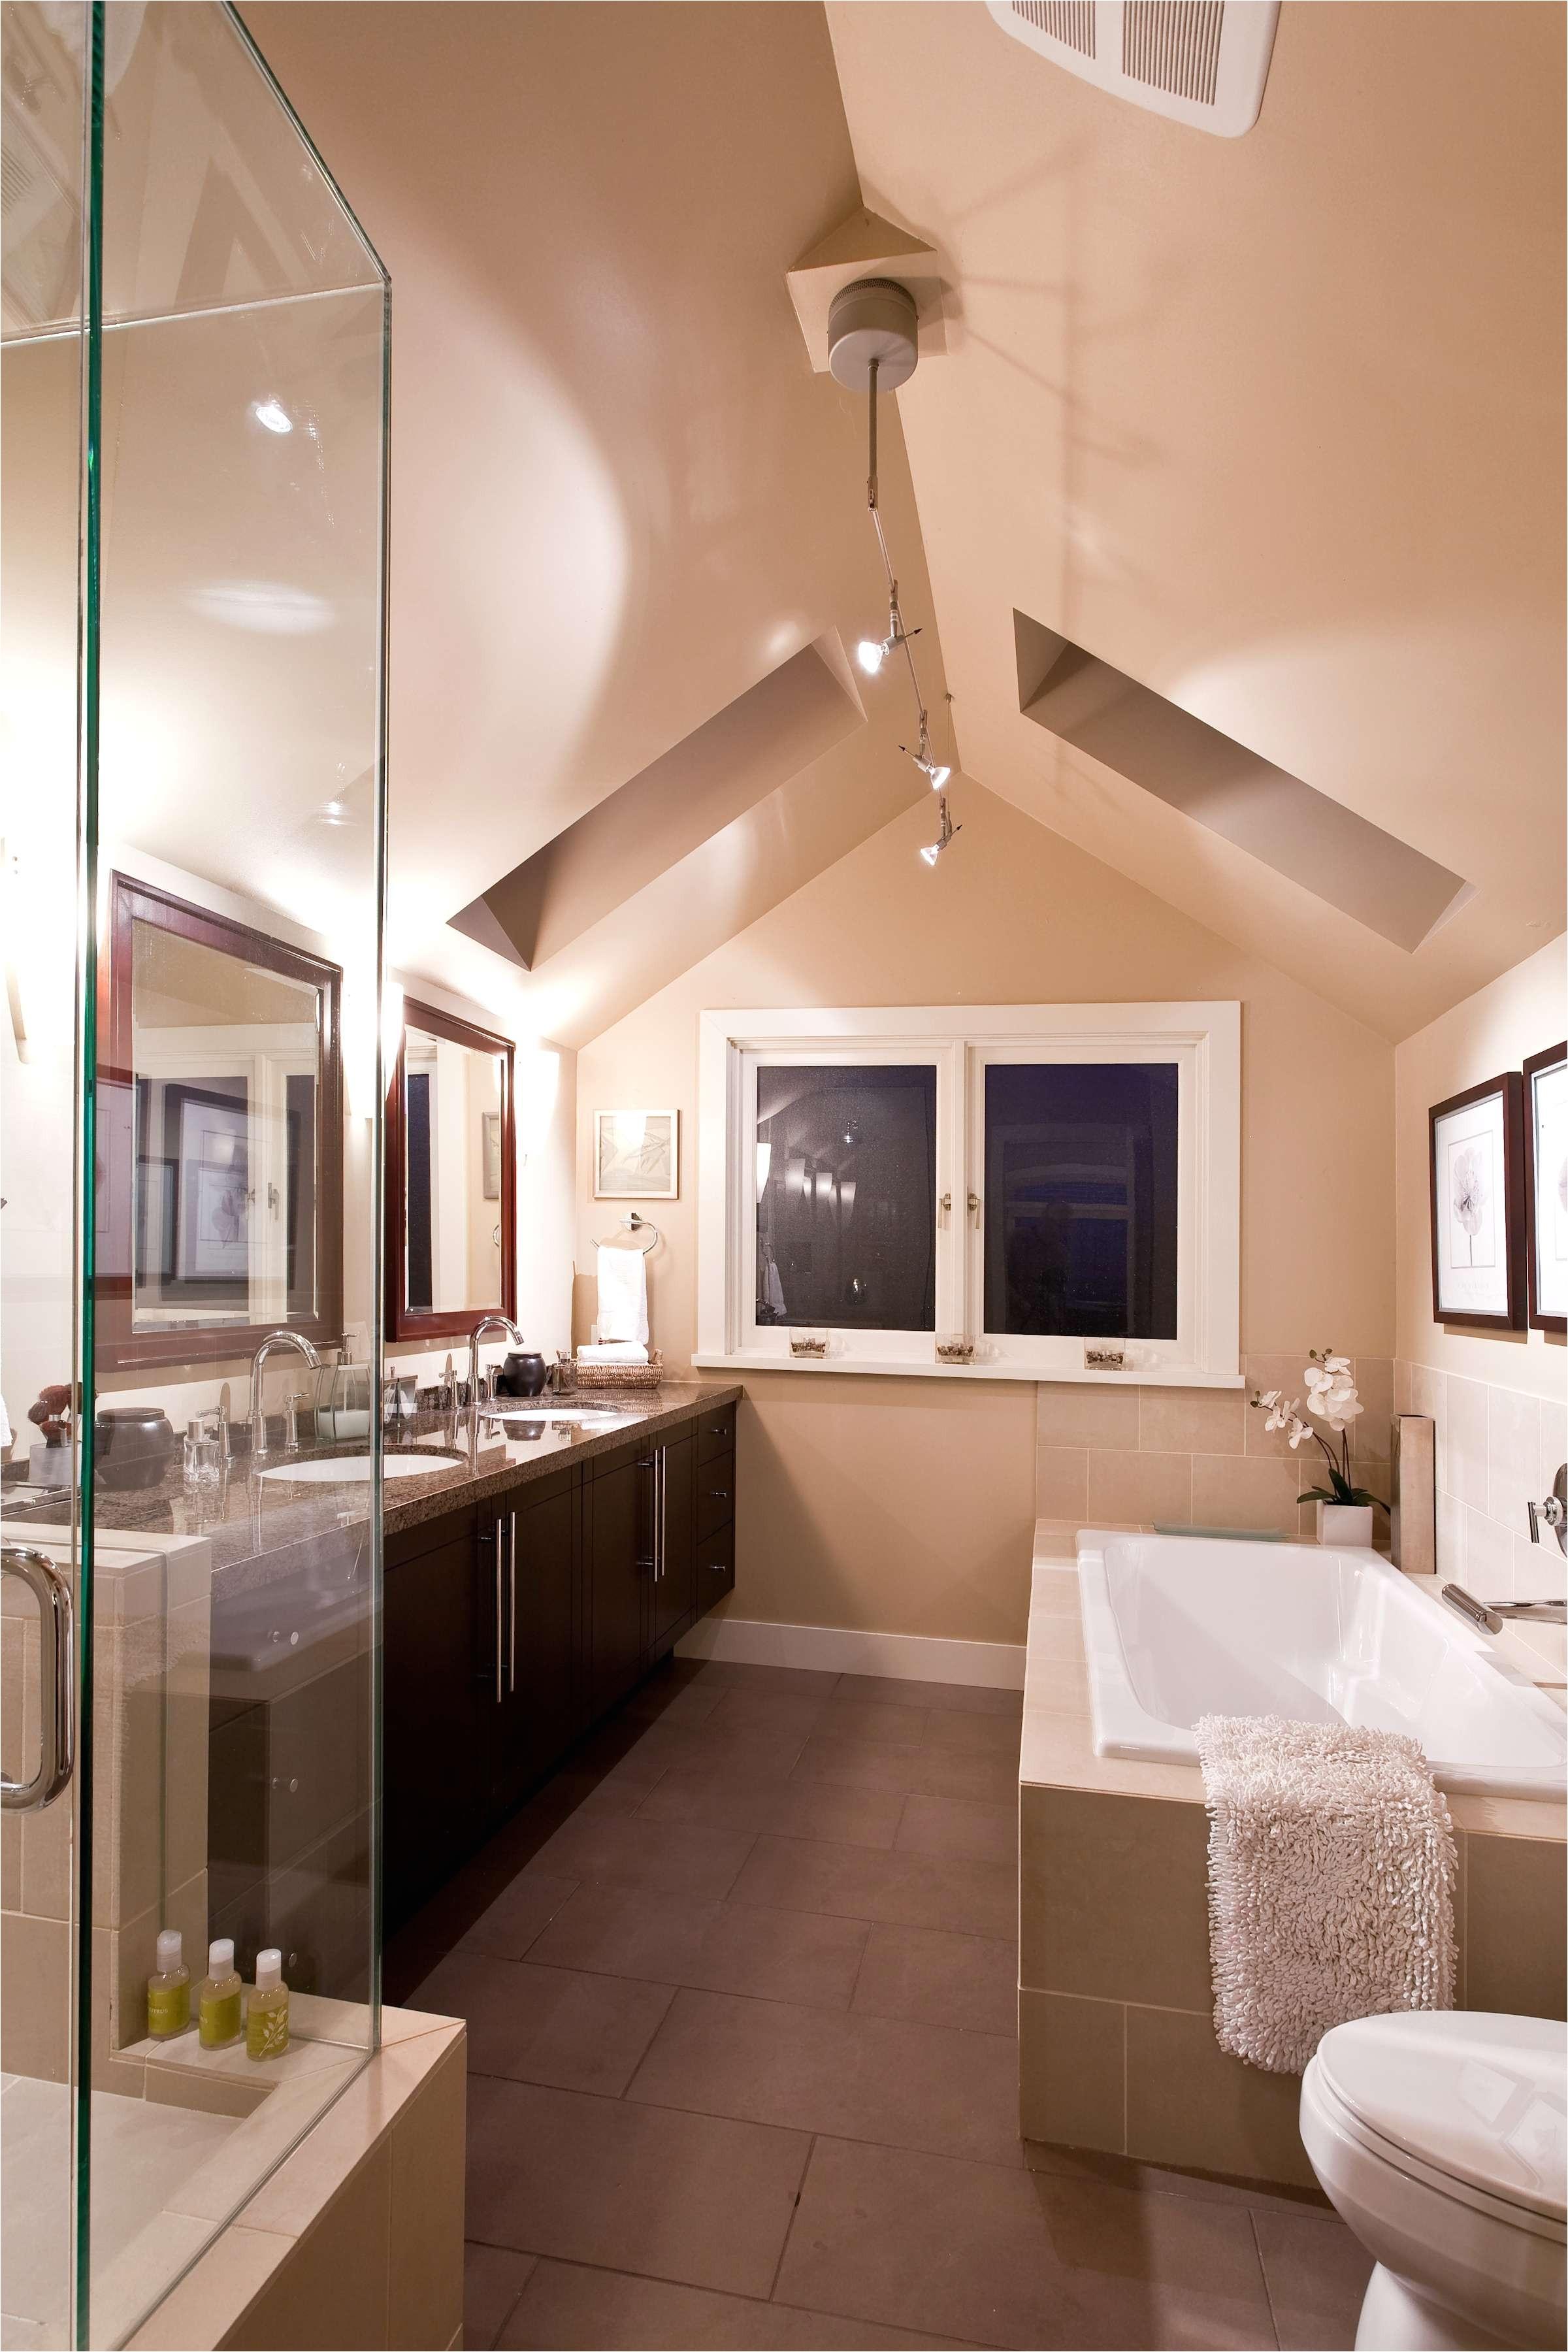 Appealing Bathroom Interior Design Ideas In Luxury Bathroom Shower Light New H Sink Install Bathroom I 0d Design